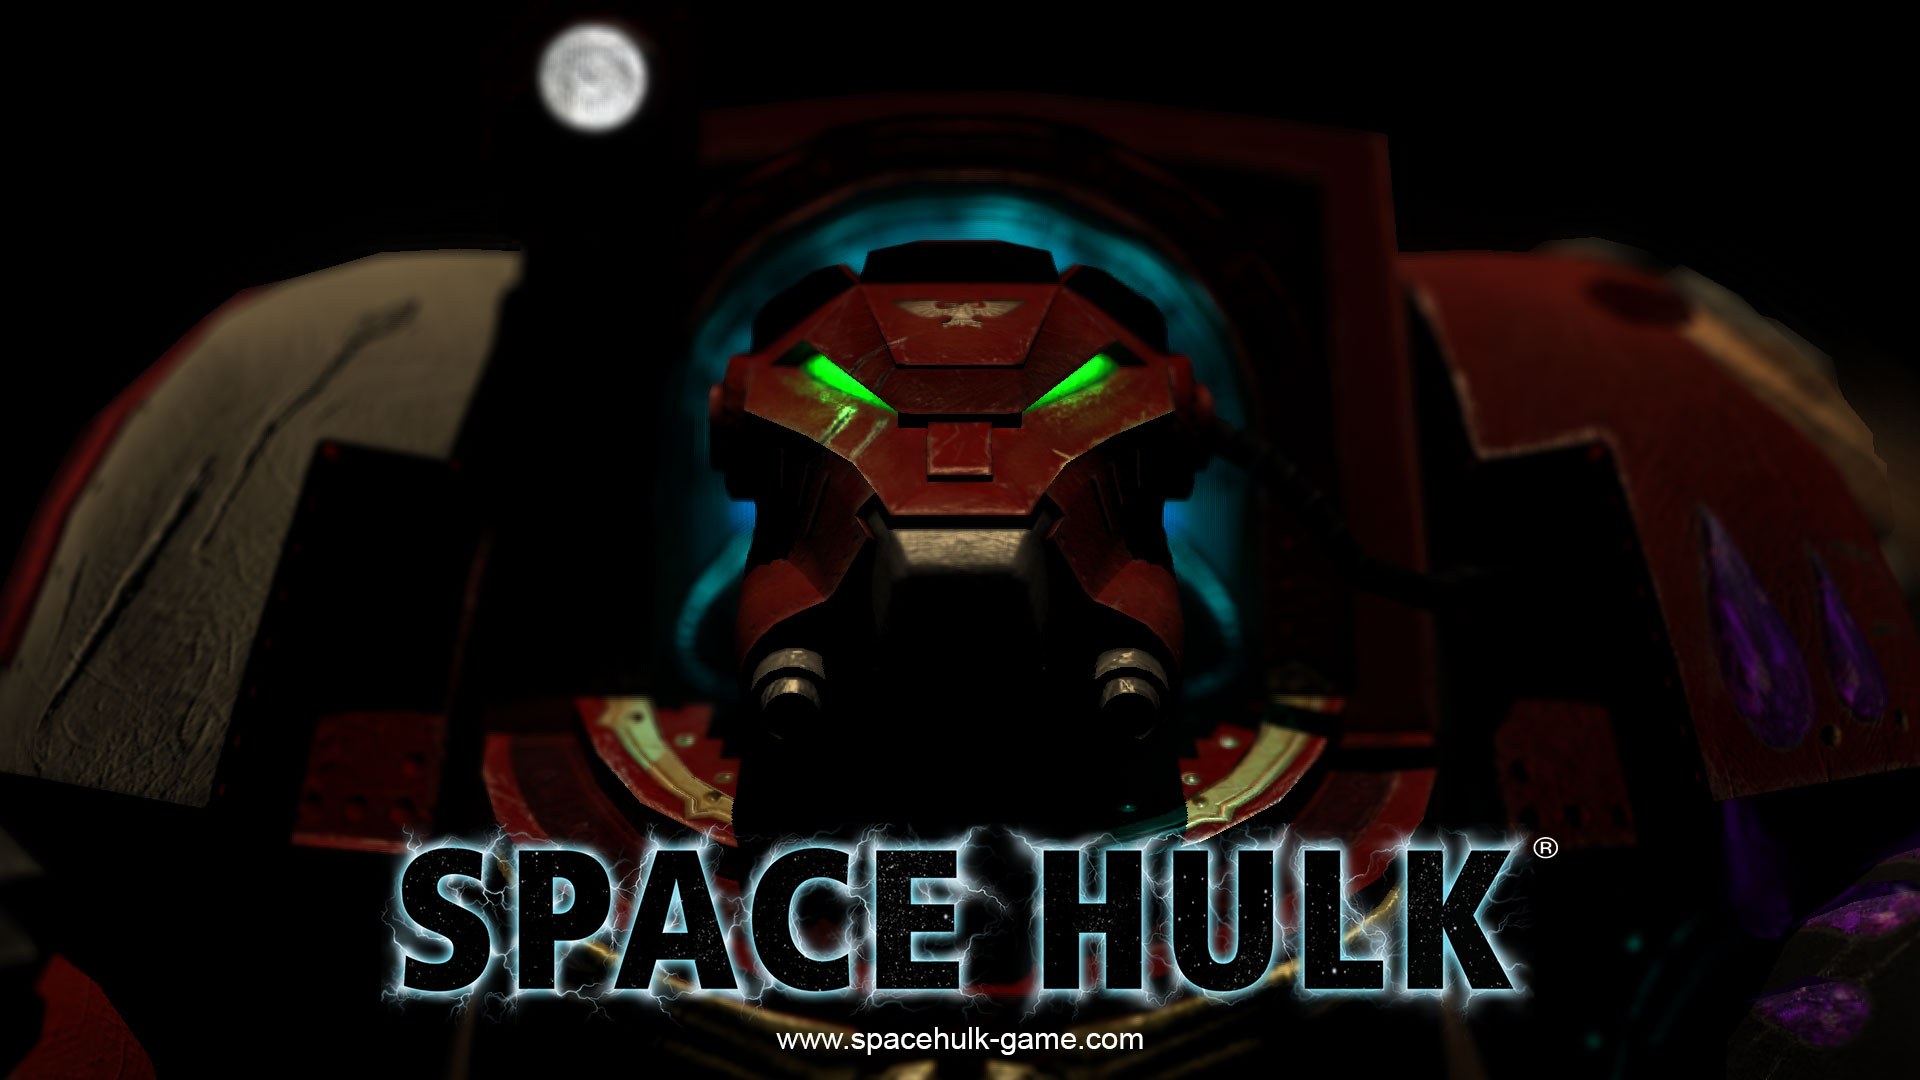 Space-Hulk-header